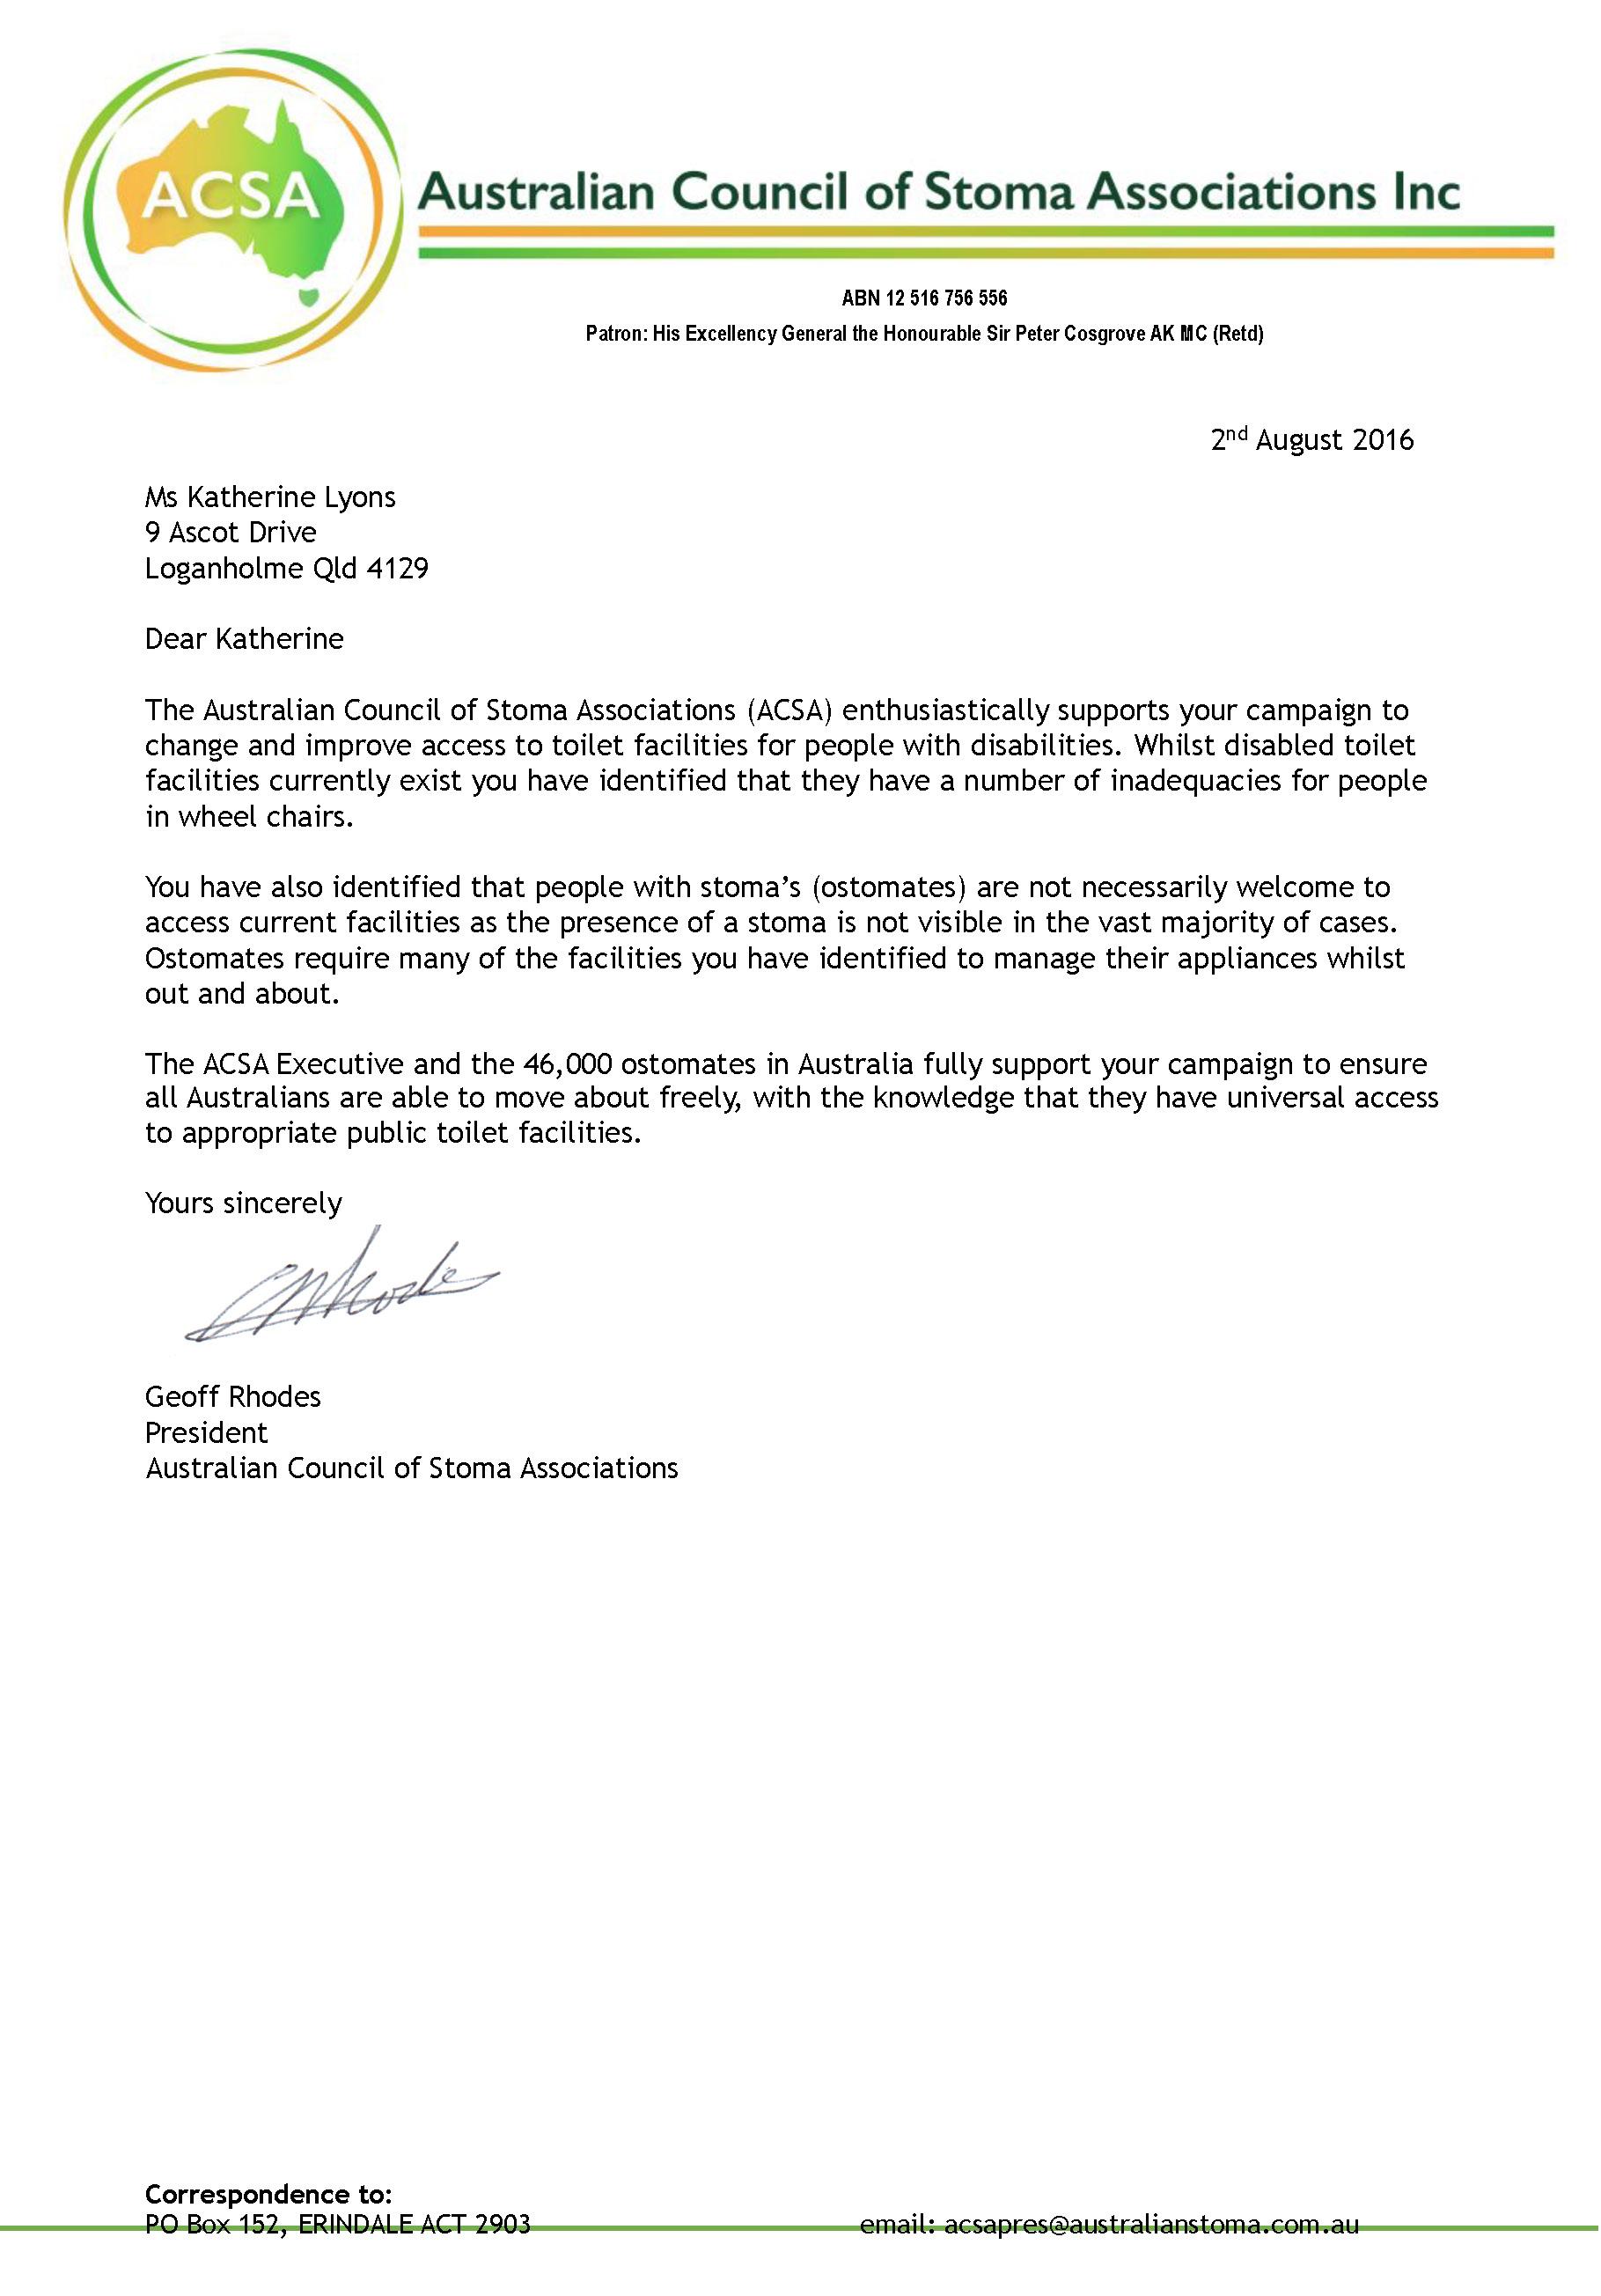 Stoma Association Support Letter.jpg